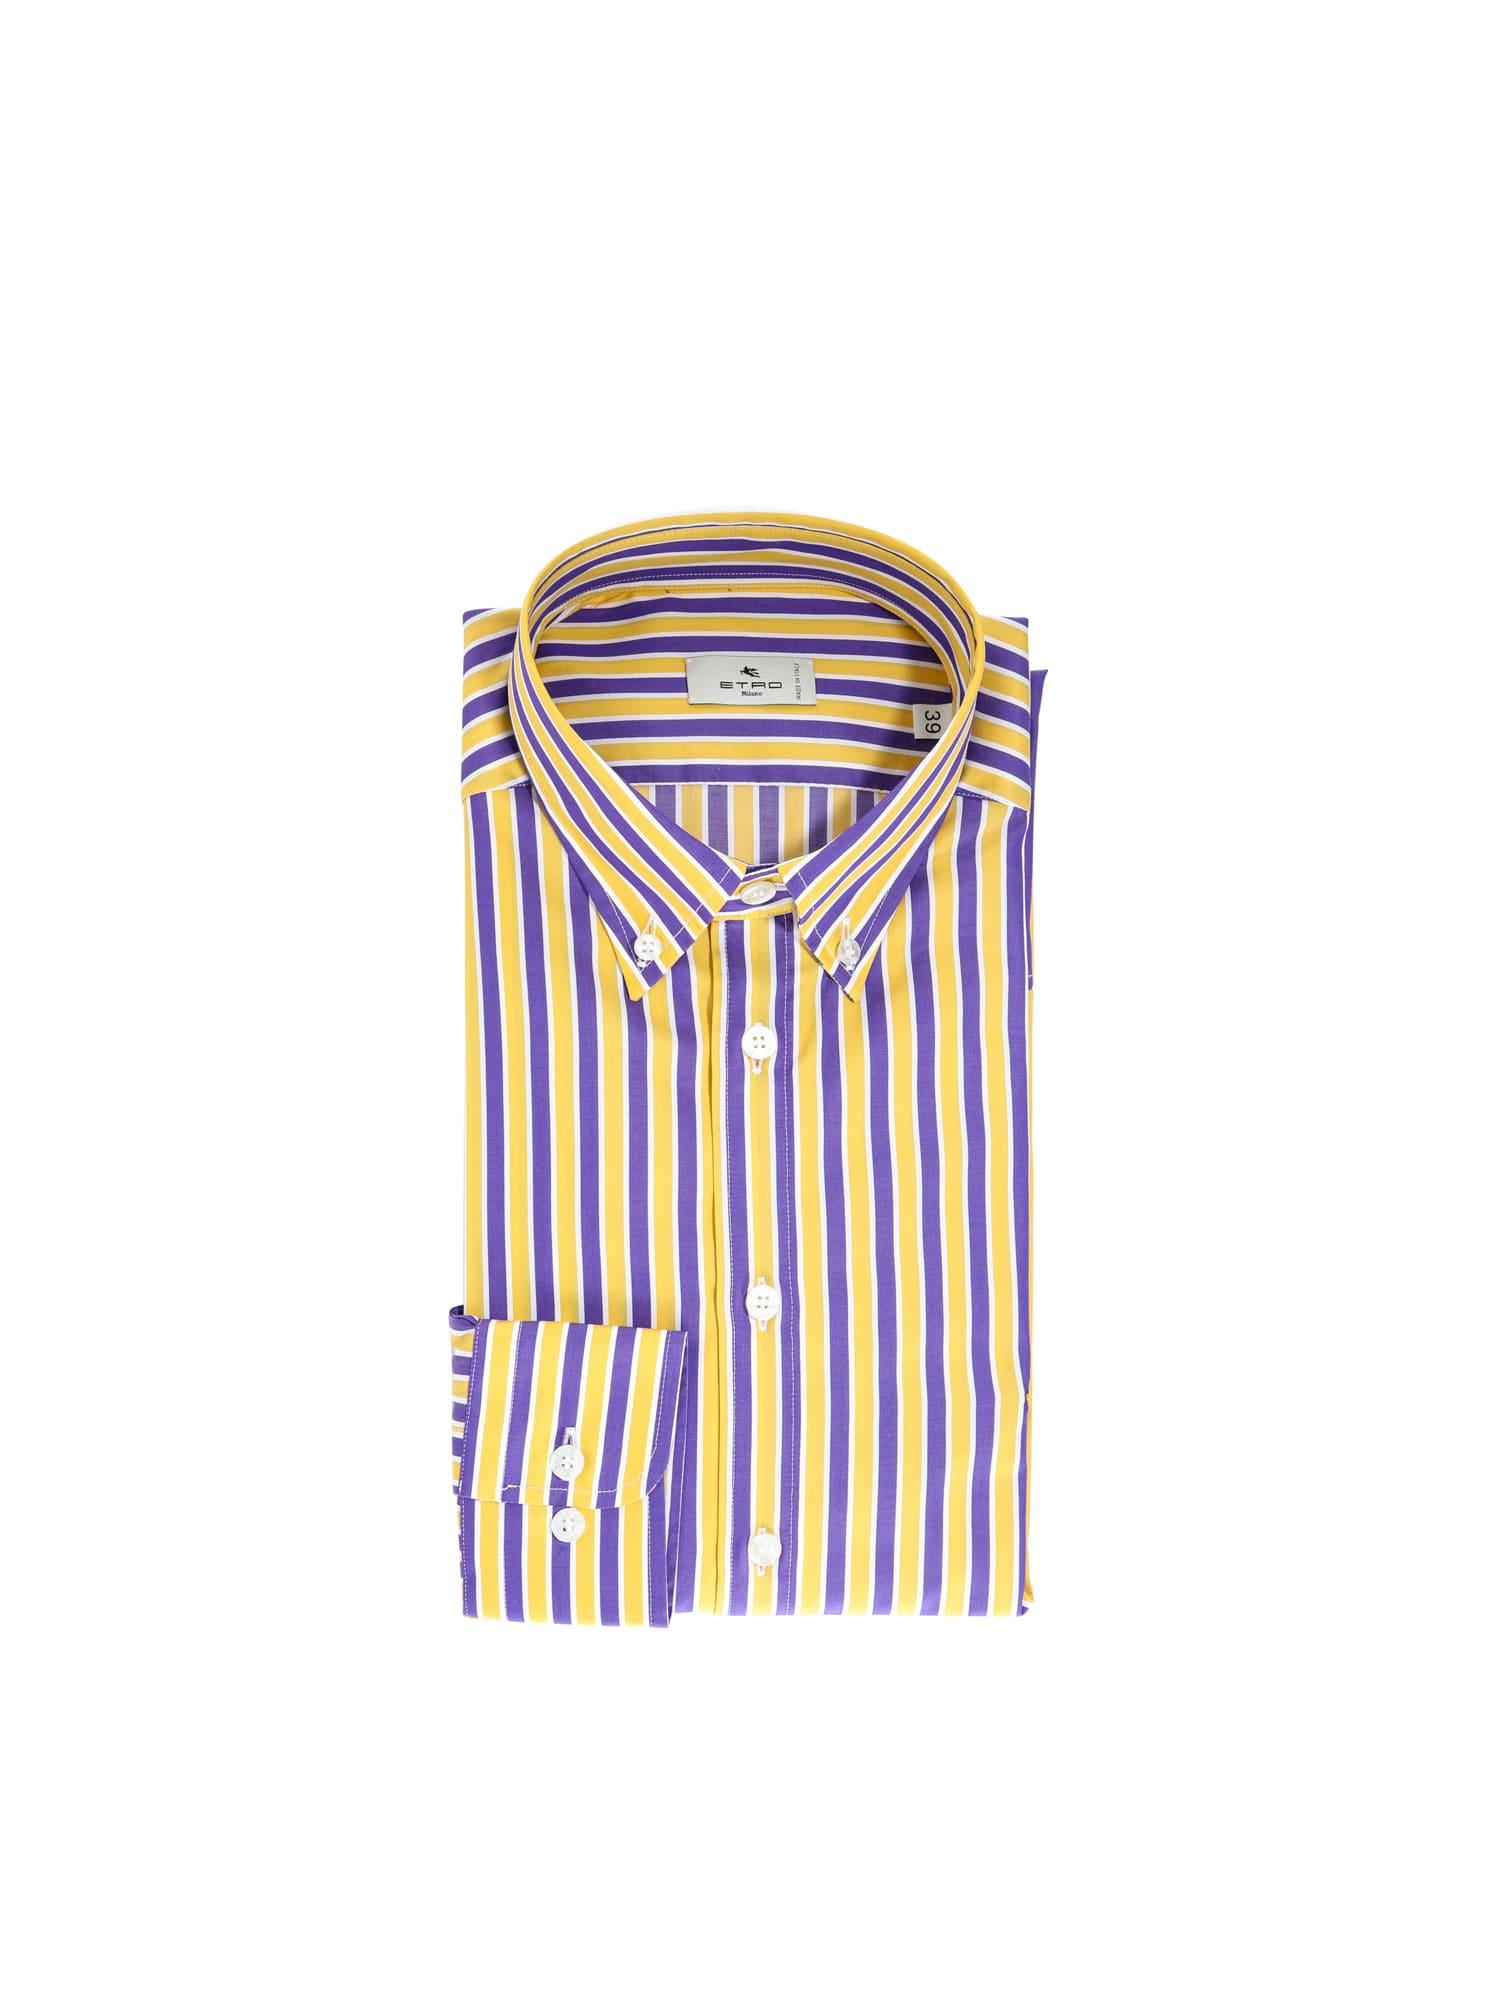 Etro Shirts SHIRT